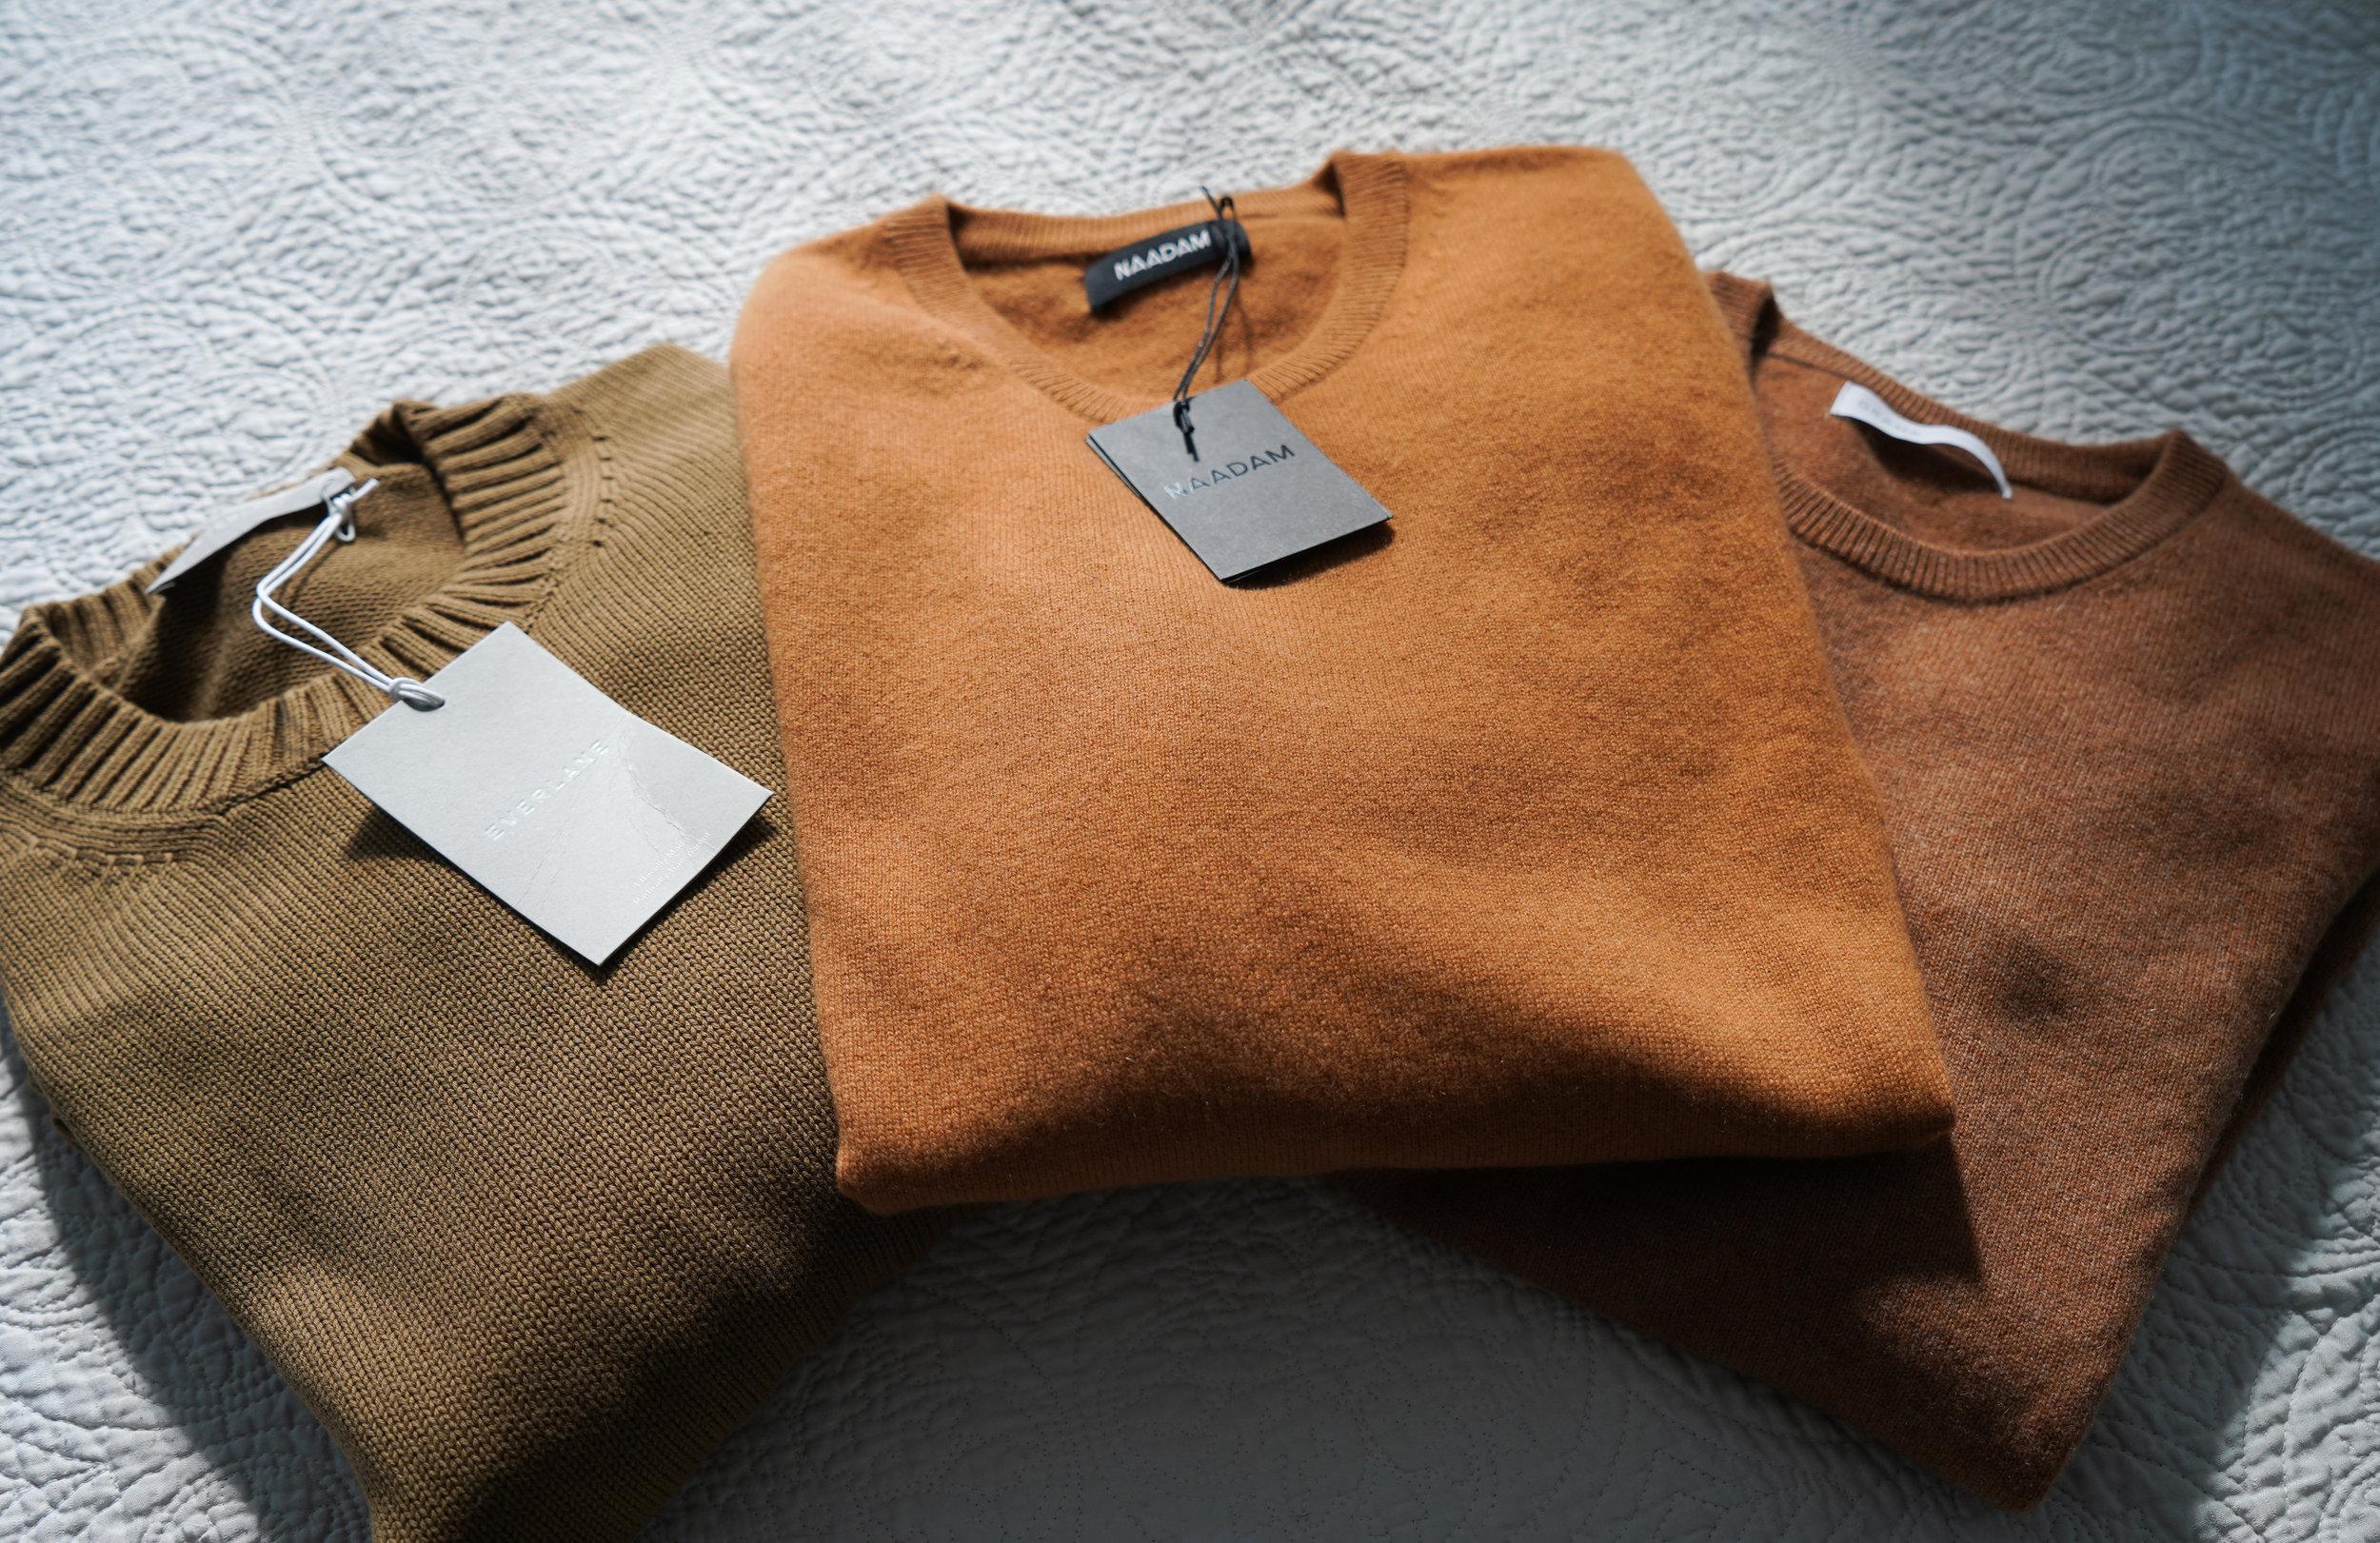 audrey-a-la-mode-naadam-cashmere-review-fall-capsule-wardrobe-everlane-cotton-crew-stone-and-strand-earrings-mejuri-9.jpg